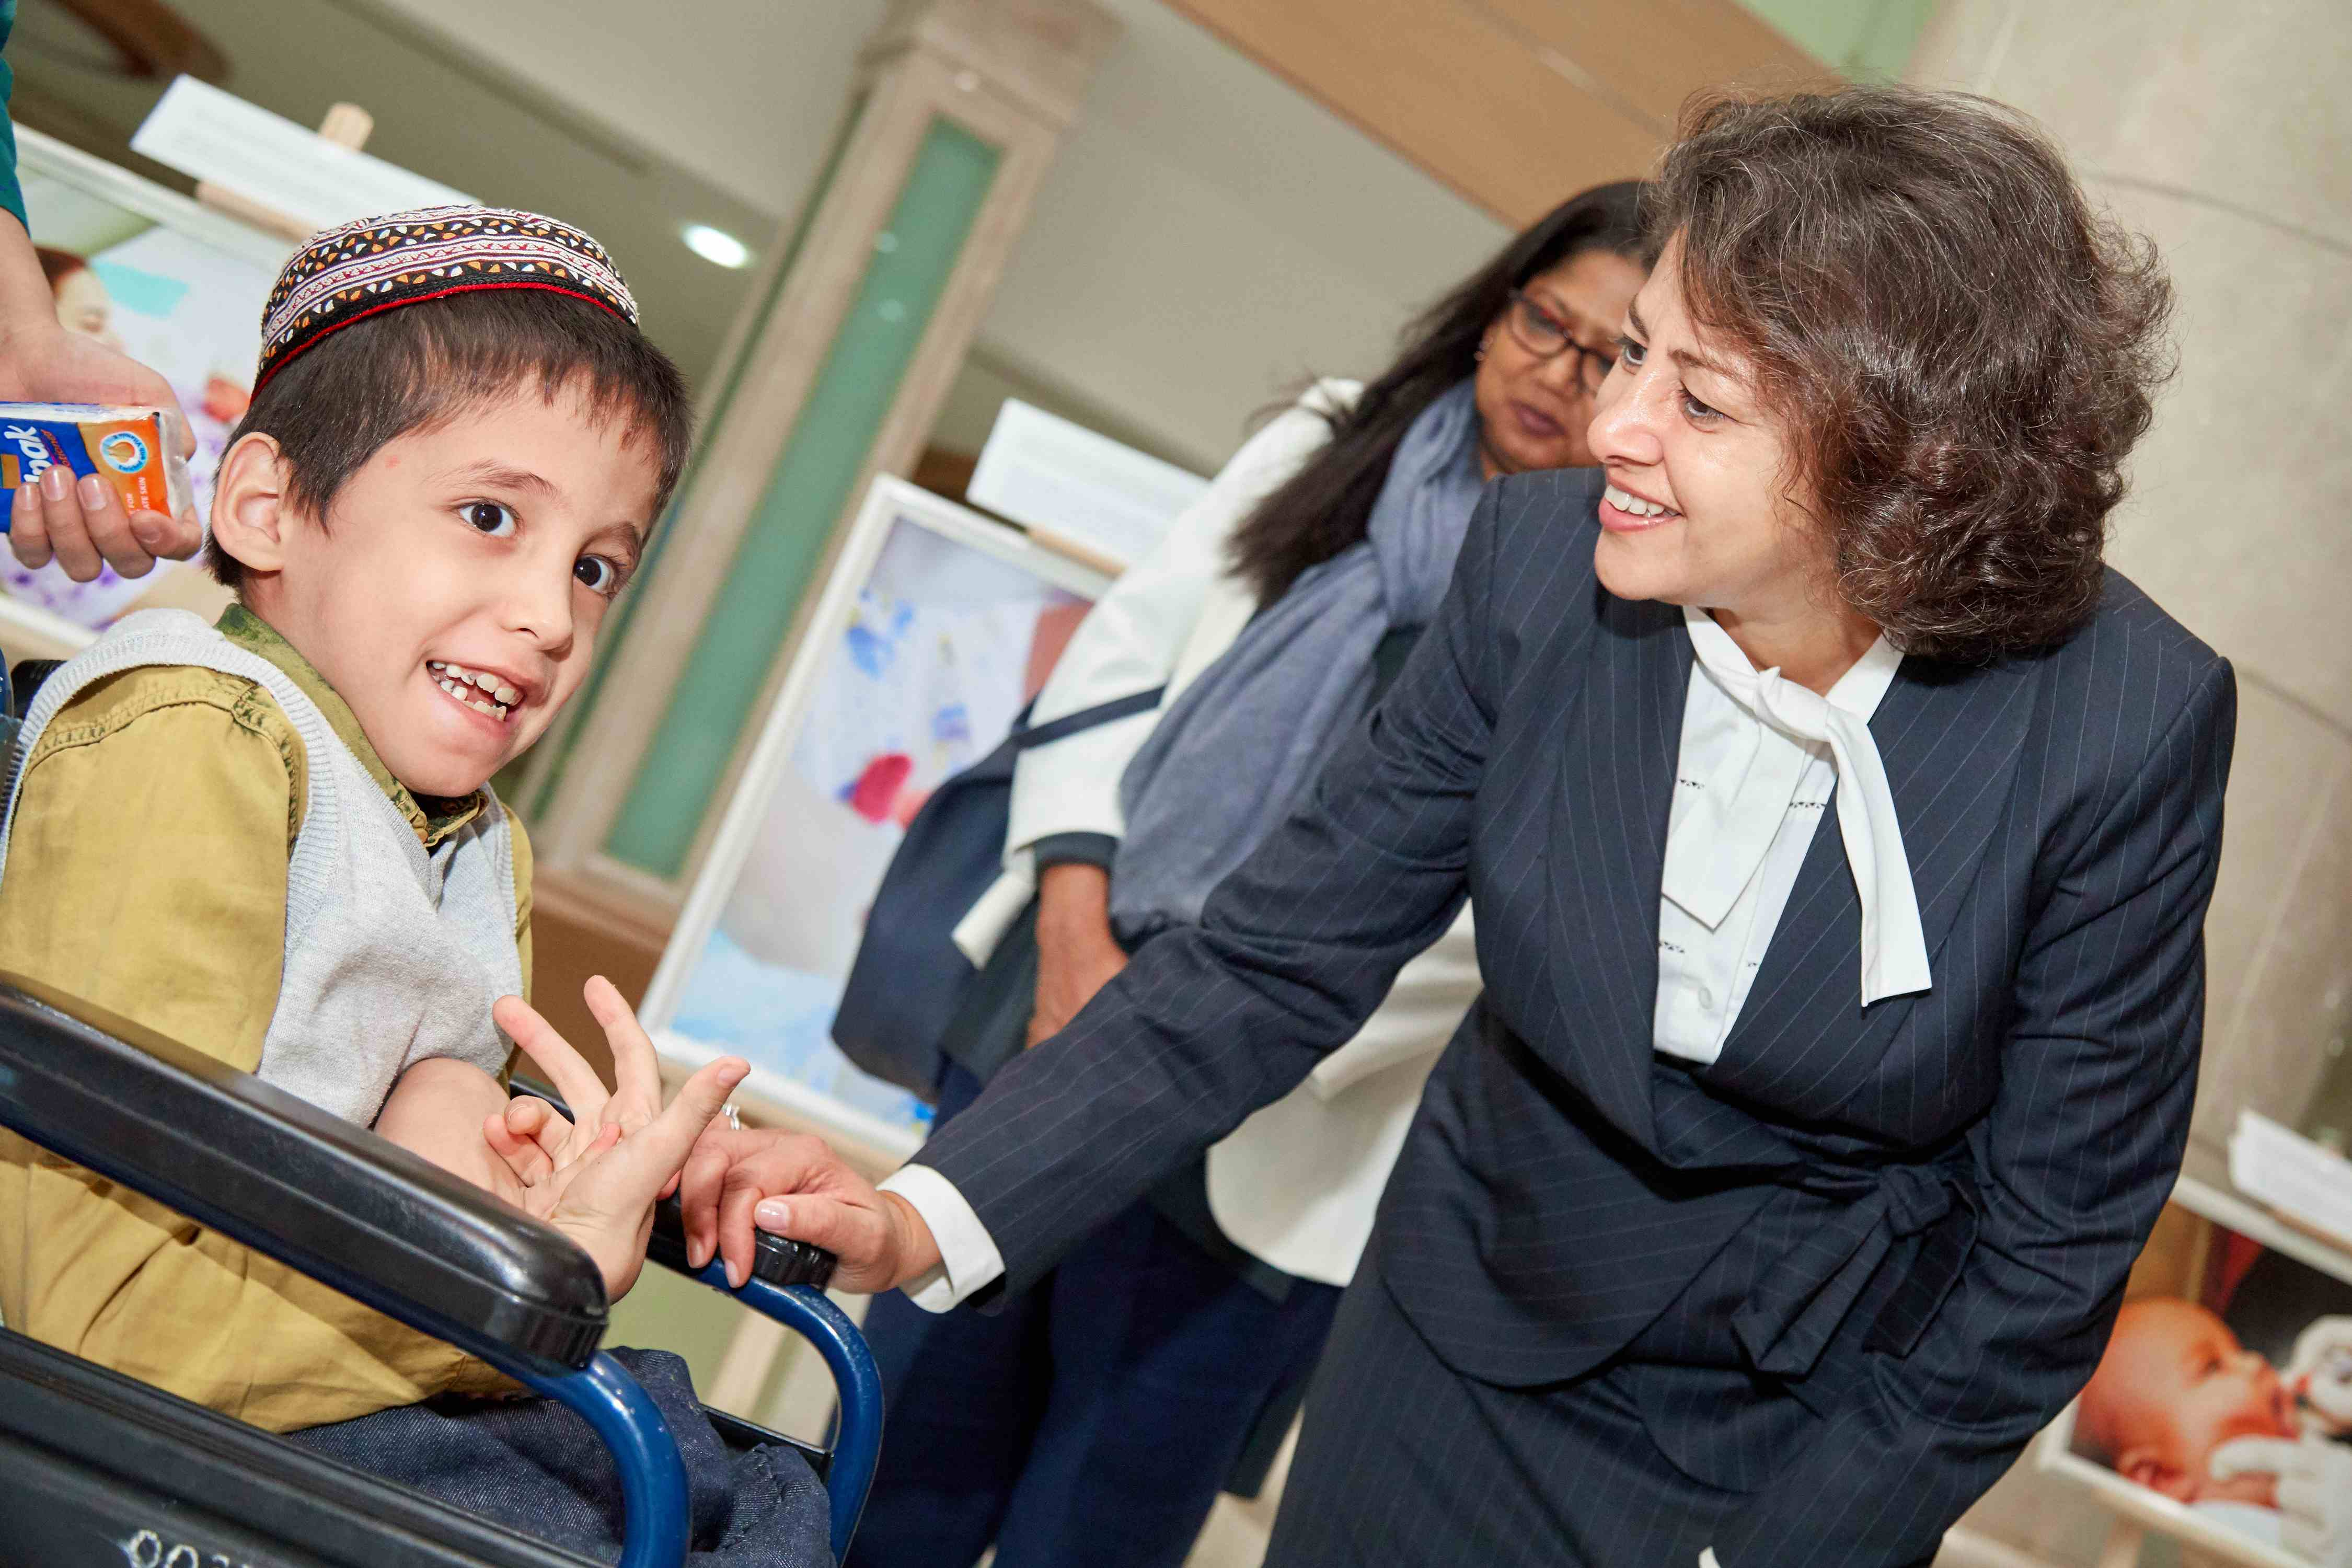 Early Childhood Development services help children to reach their best potential in Turkmenistan